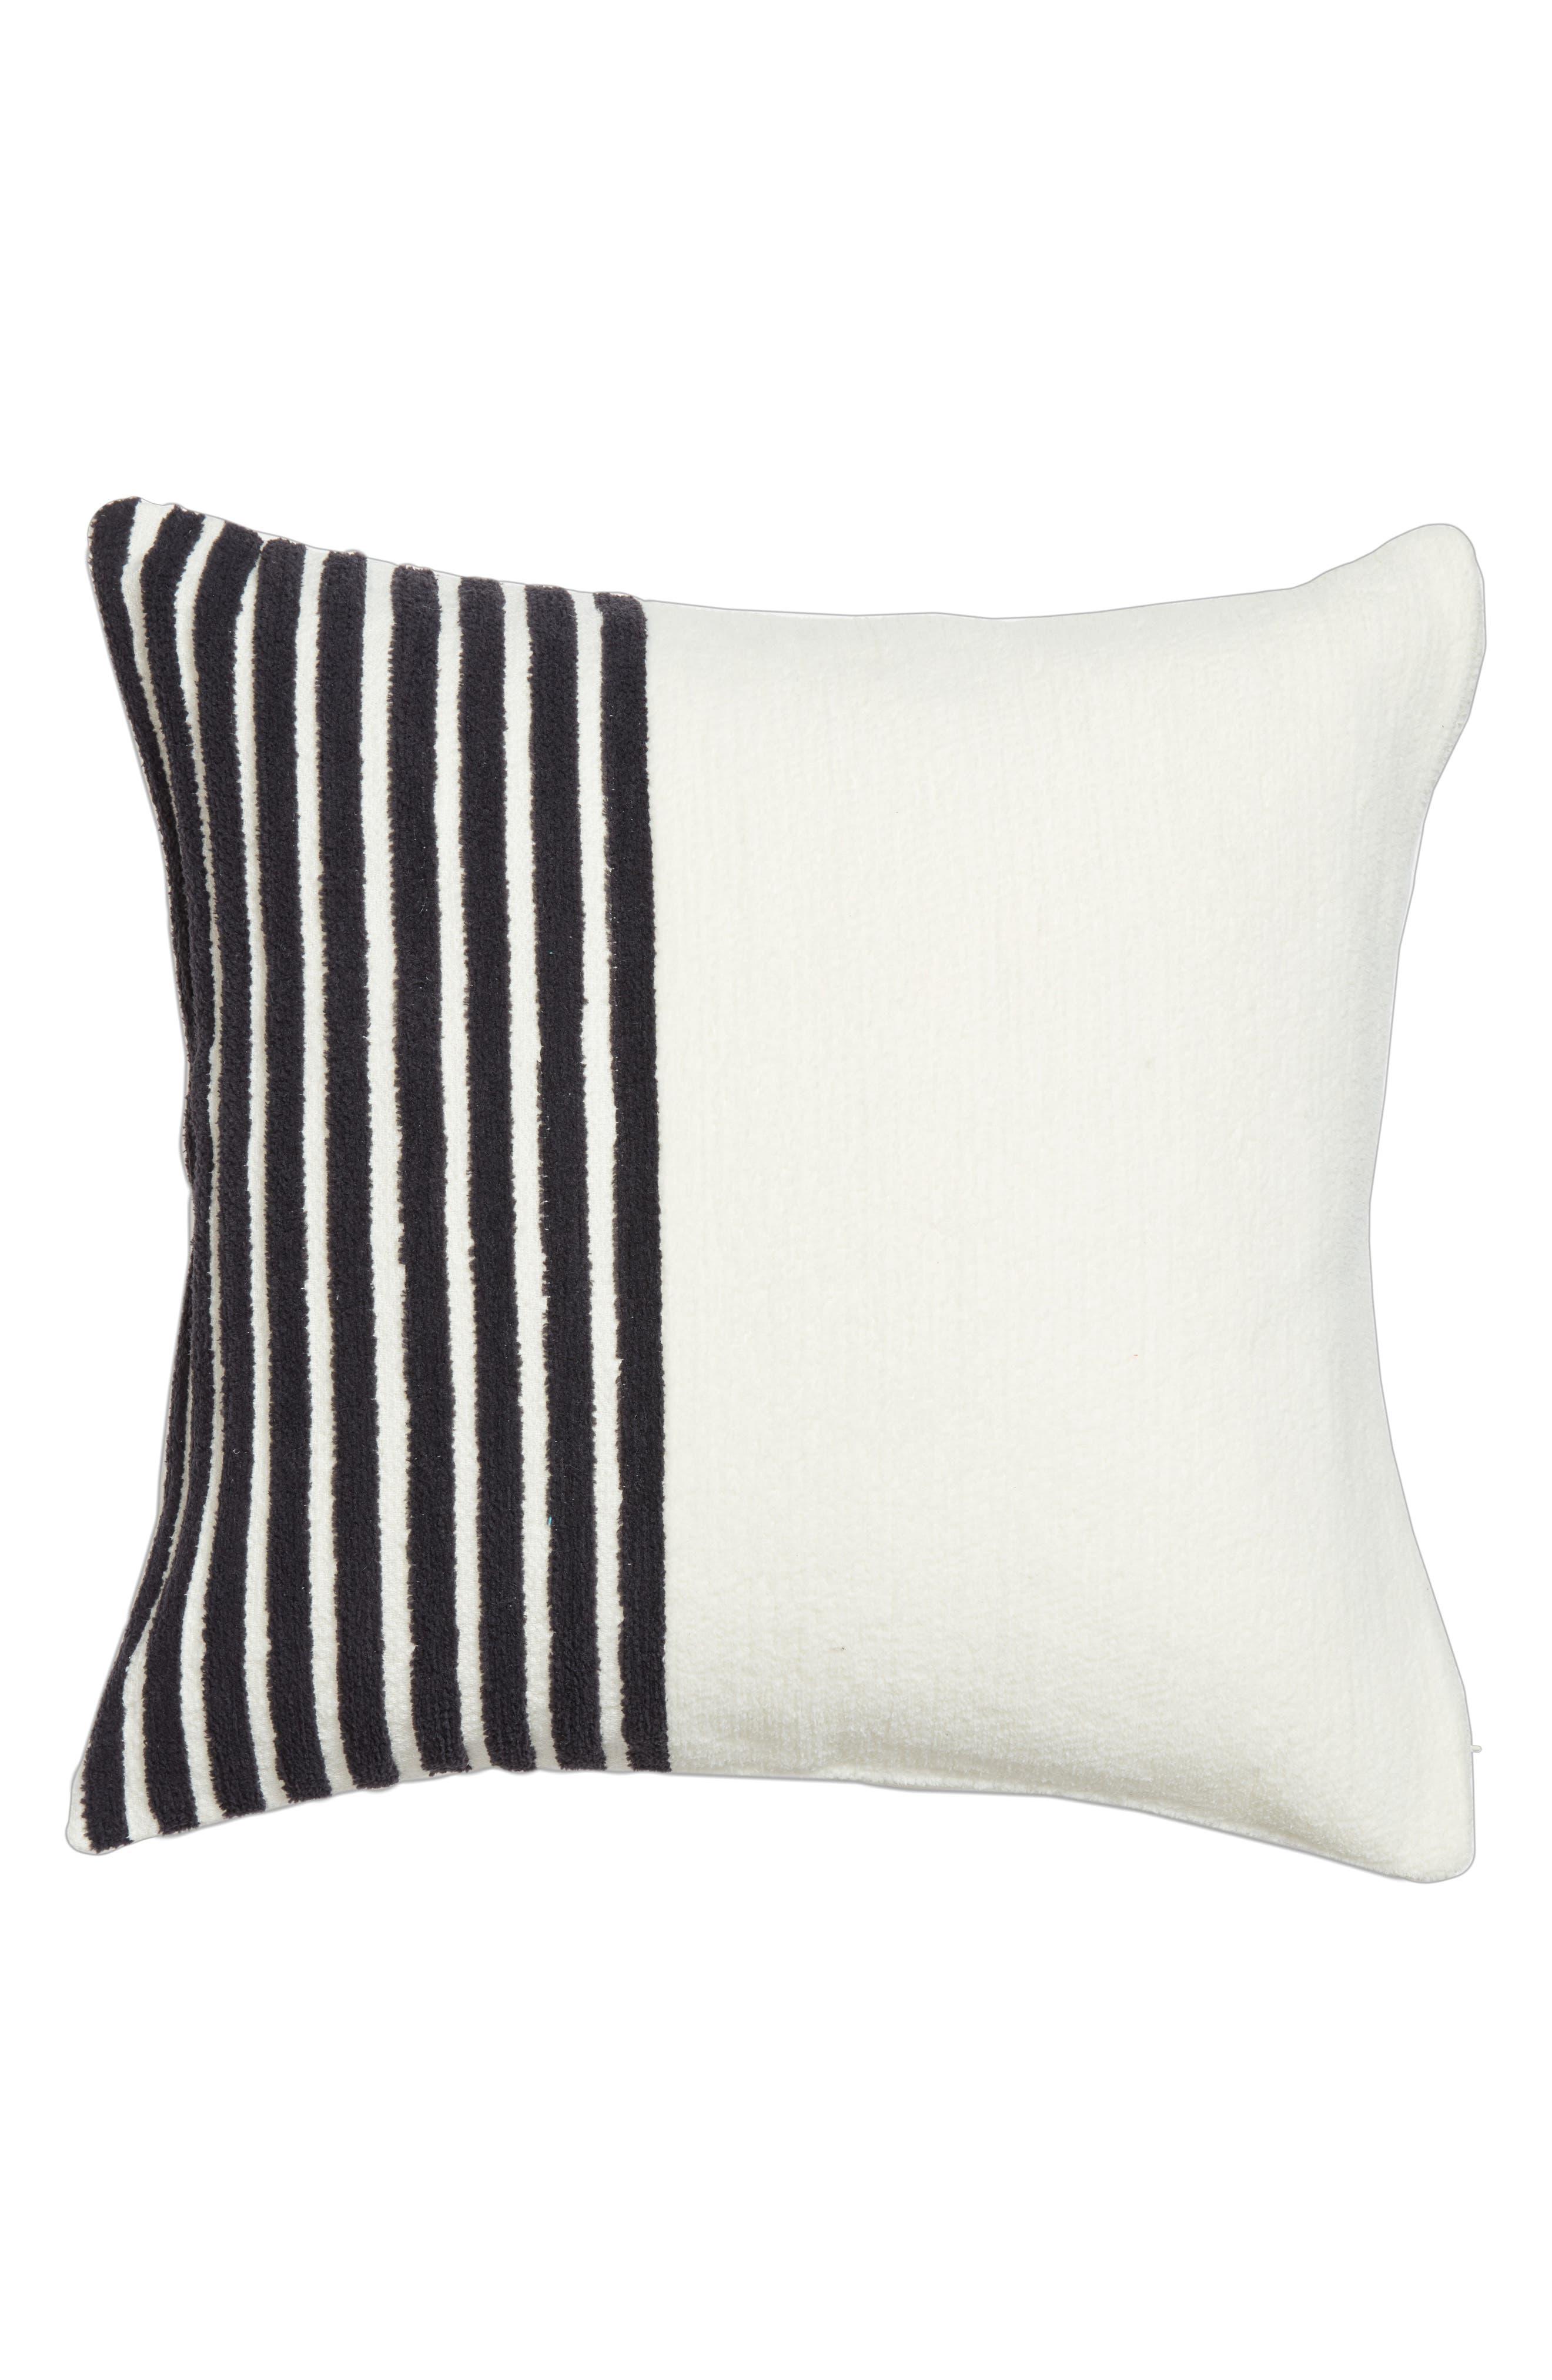 Hammam Stripe Accent Pillow,                             Main thumbnail 3, color,